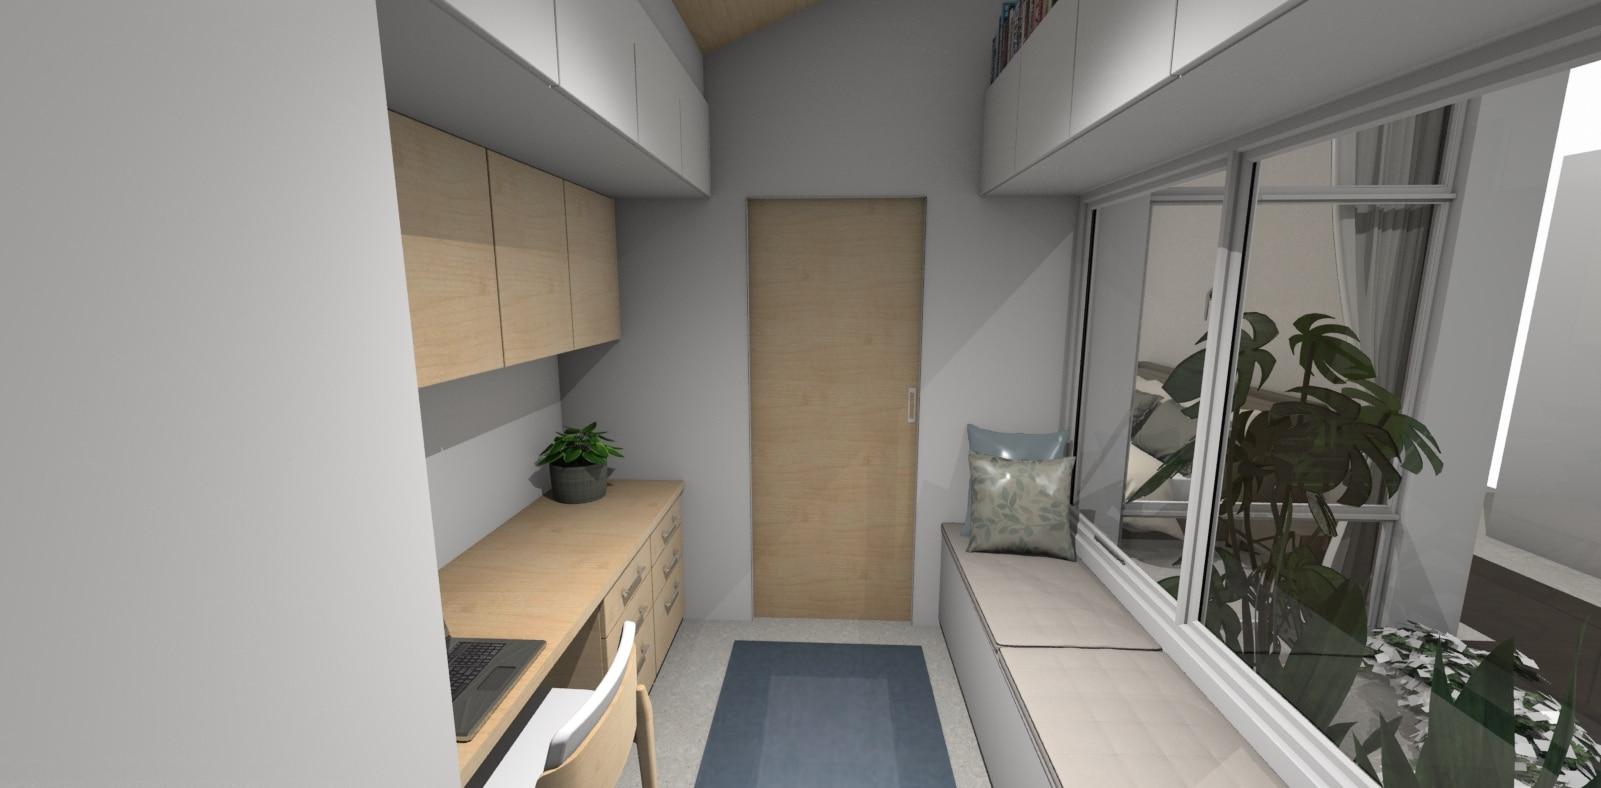 Home office 3D render in a long slim space 2